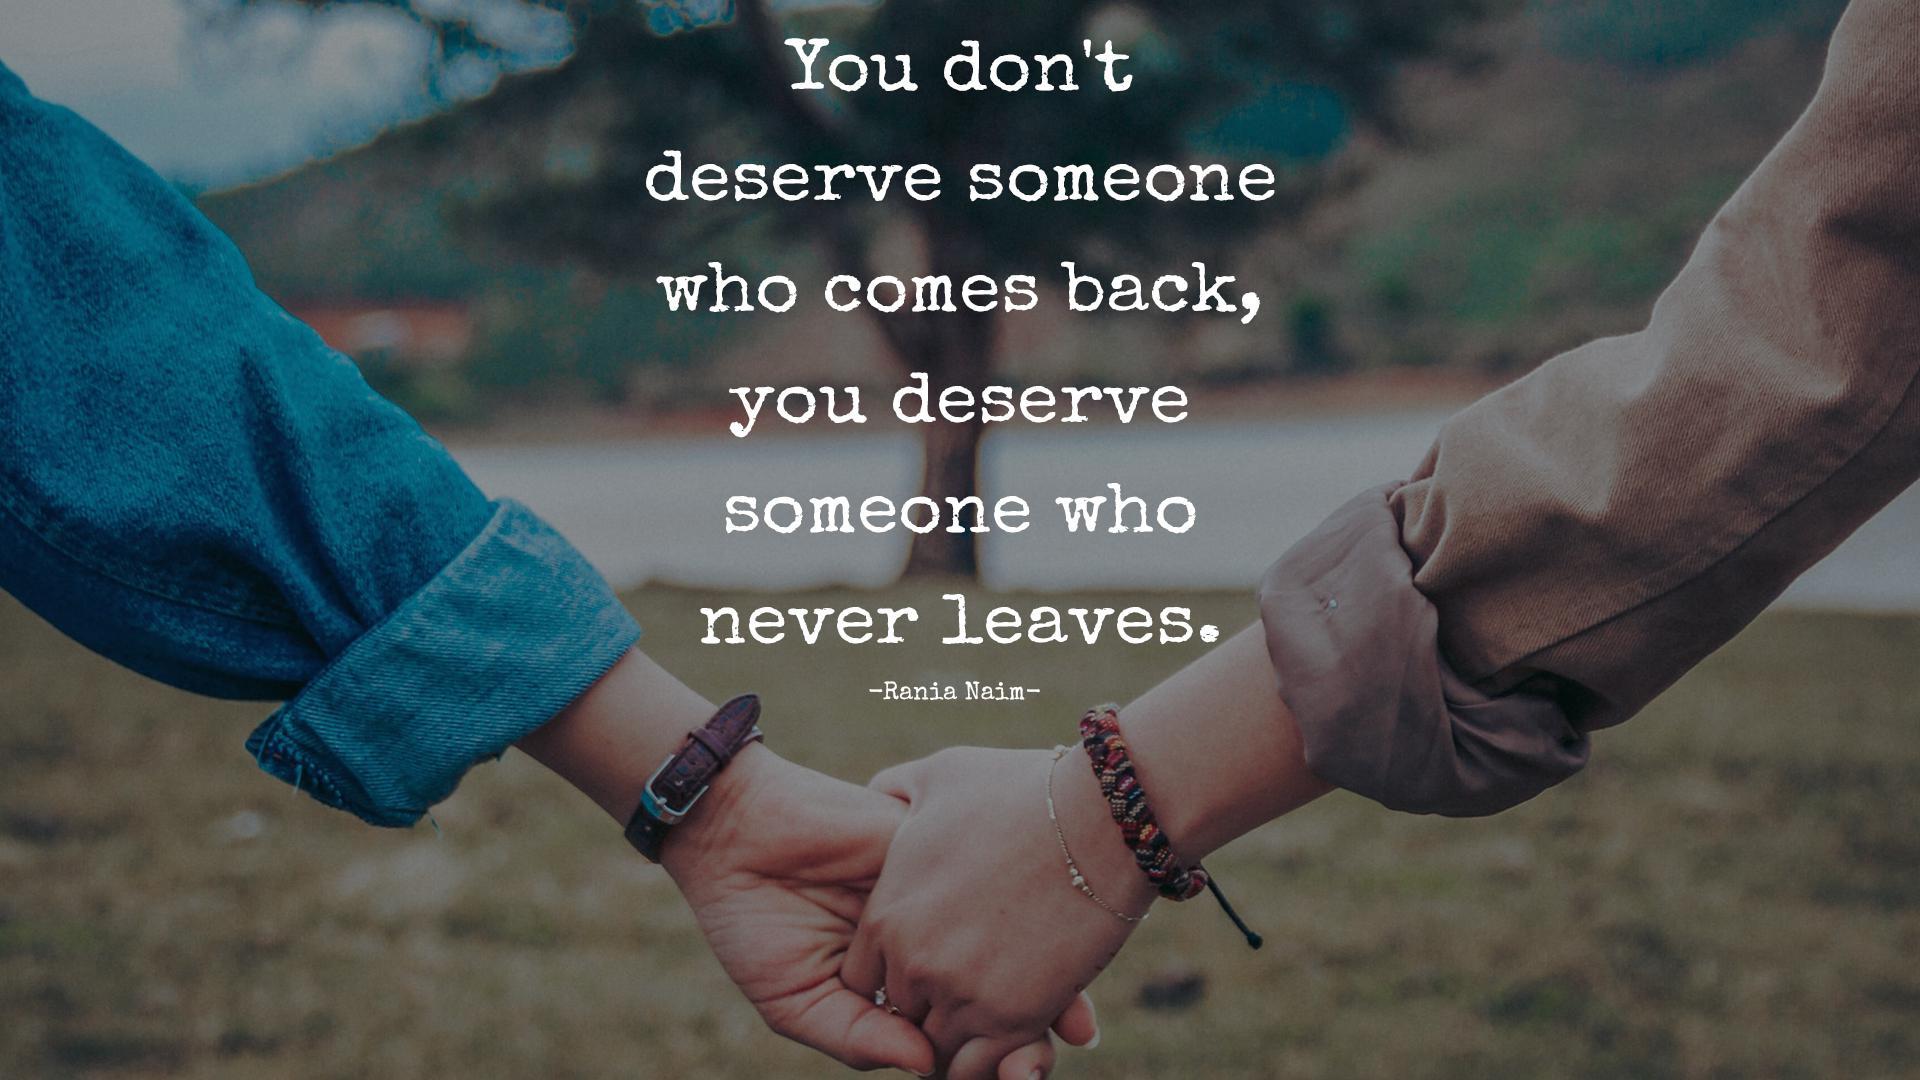 You don't deserve someone who comes back-Rania Naim[1920×1080]